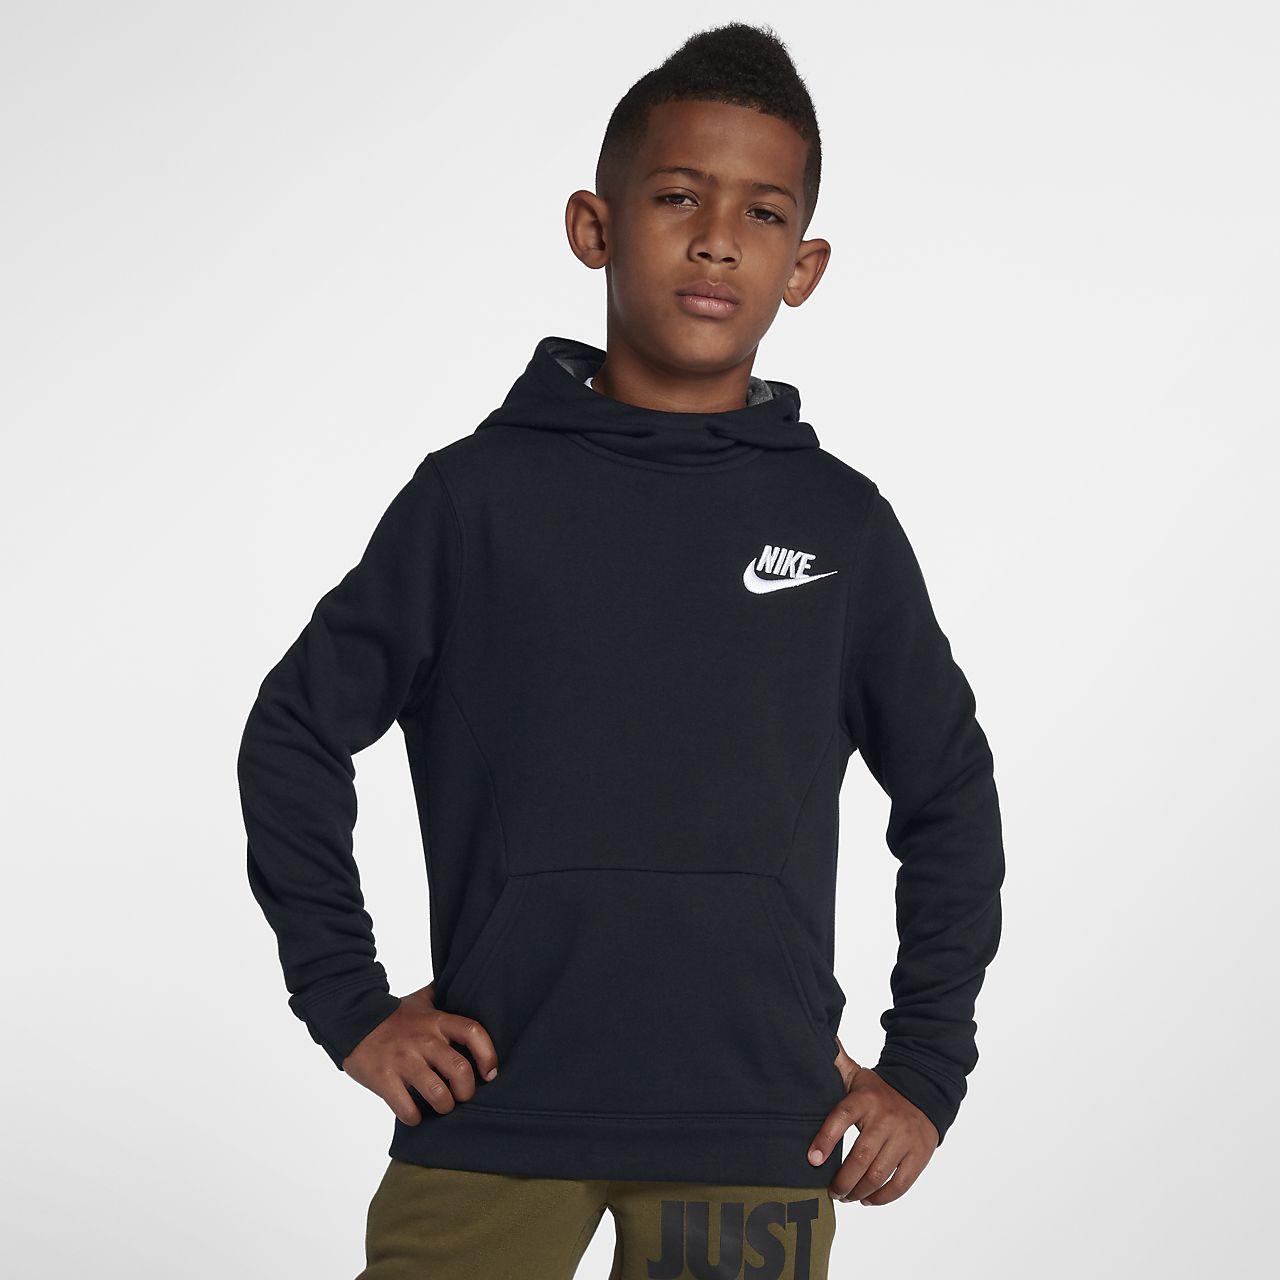 07fc3590441a28 Nike Sportswear Big Kids  (Boys ) Pullover Hoodie. Nike.com